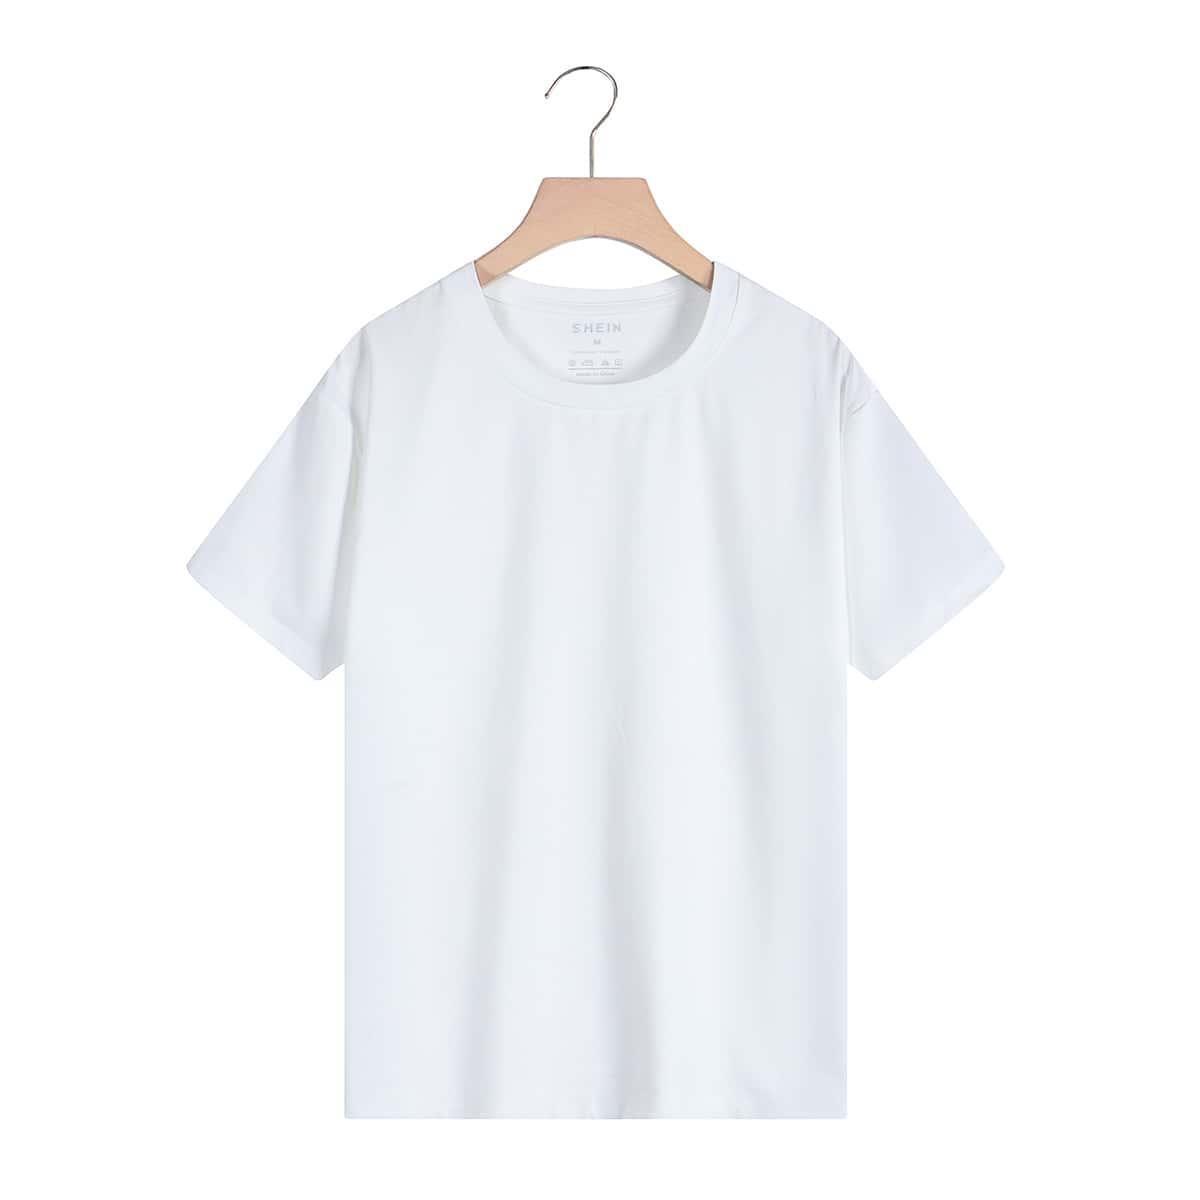 Однотонная футболка SheIn swtee24210517324